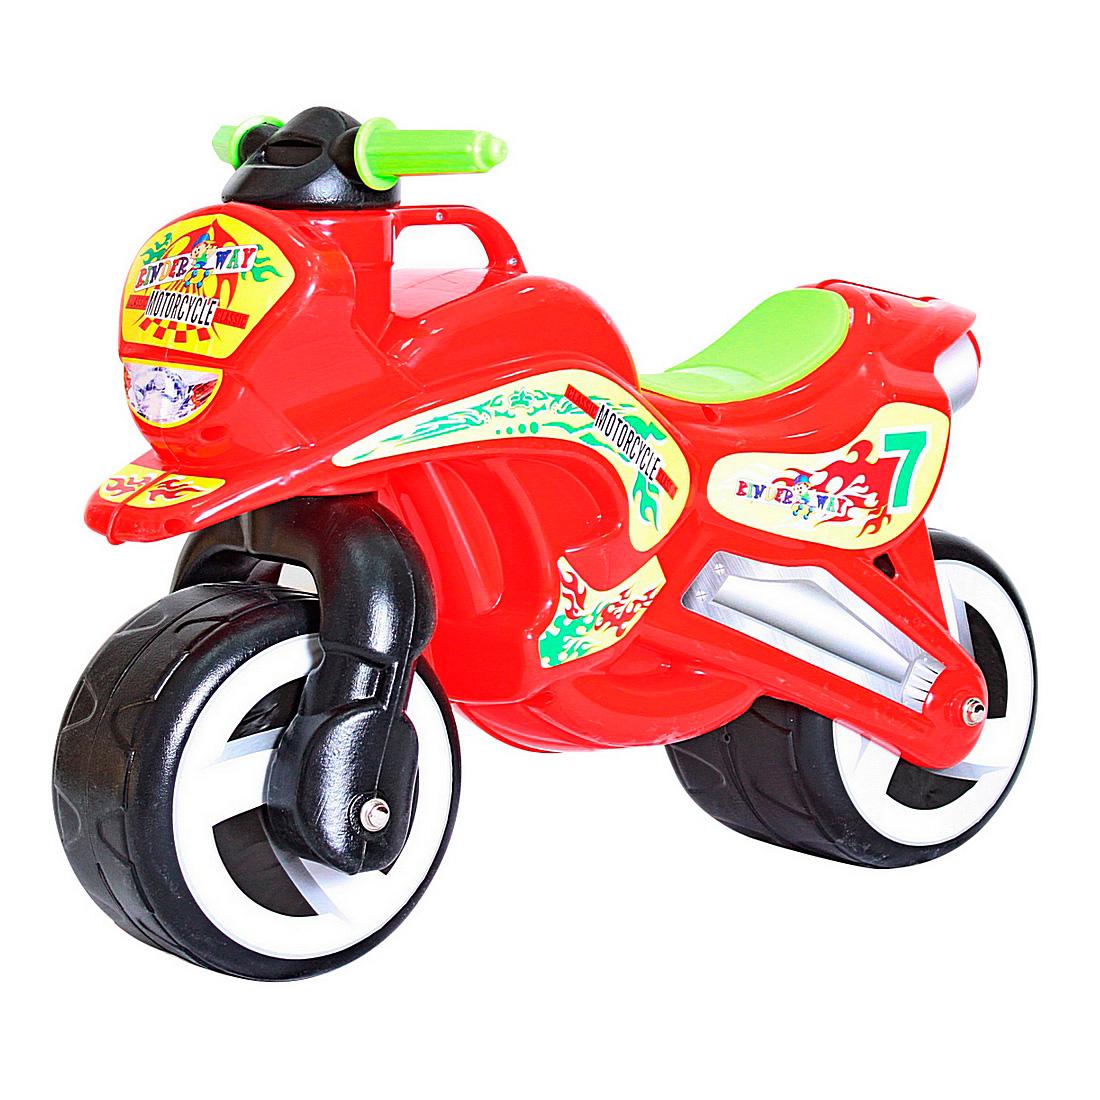 Беговел RT 11-006 MotorCycle 7 Красный<br>